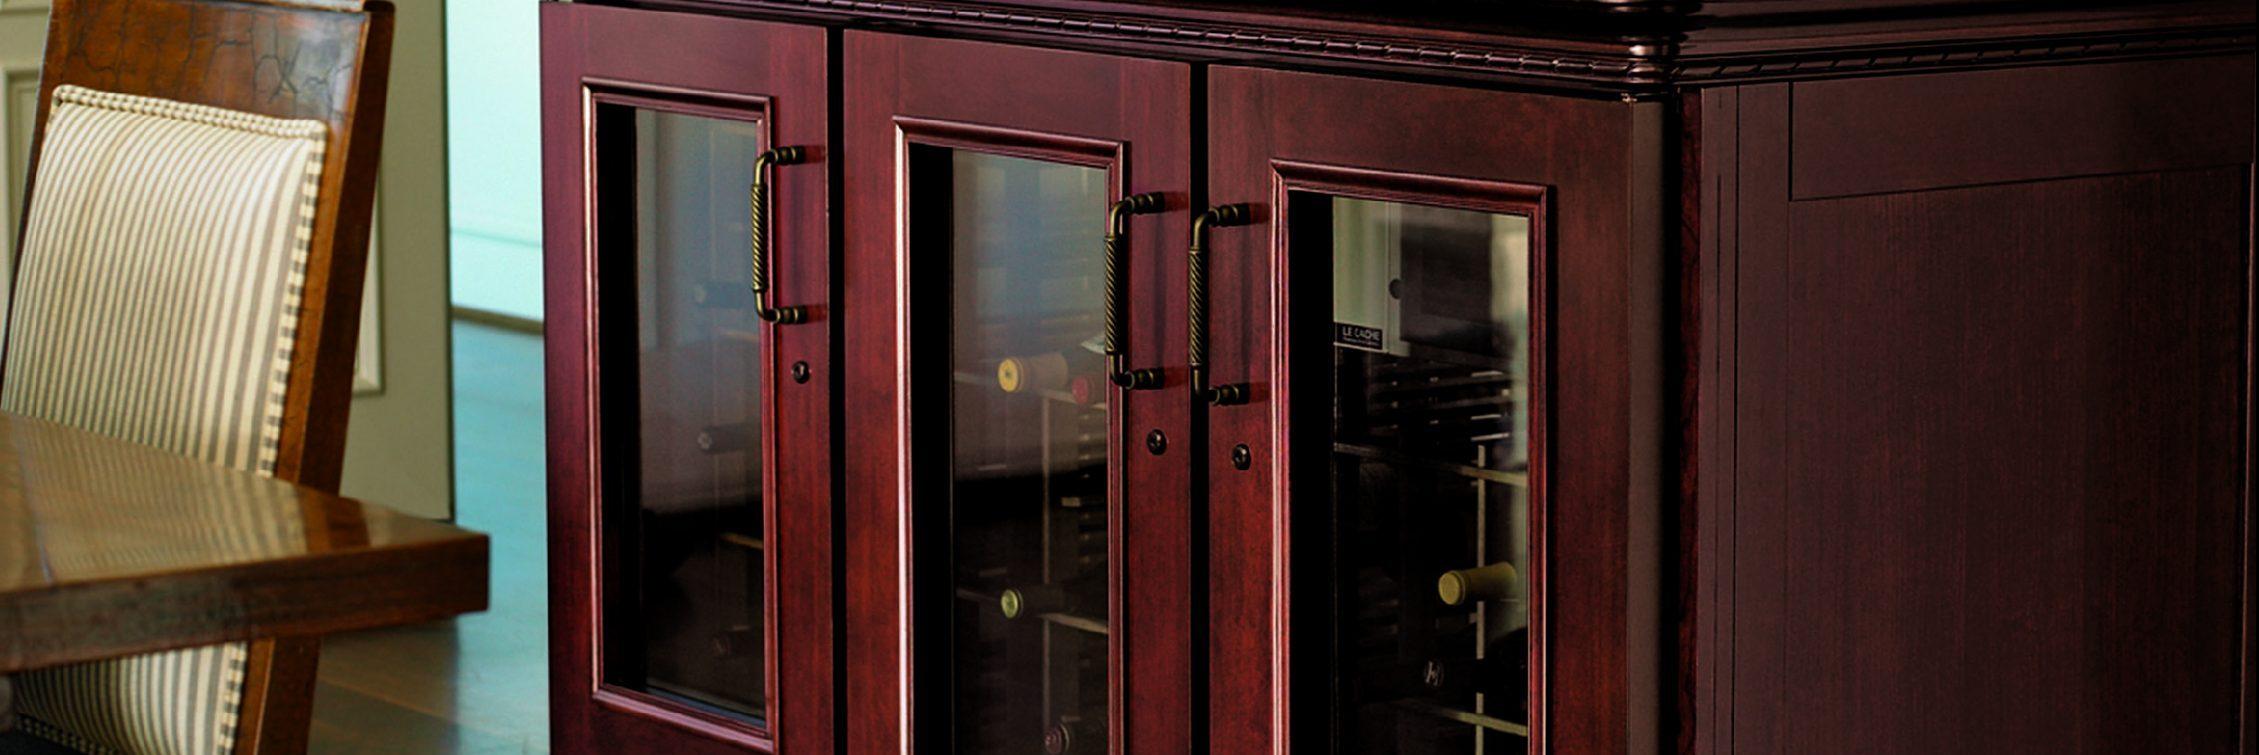 Credenza Wine Cabinets by Le Cache